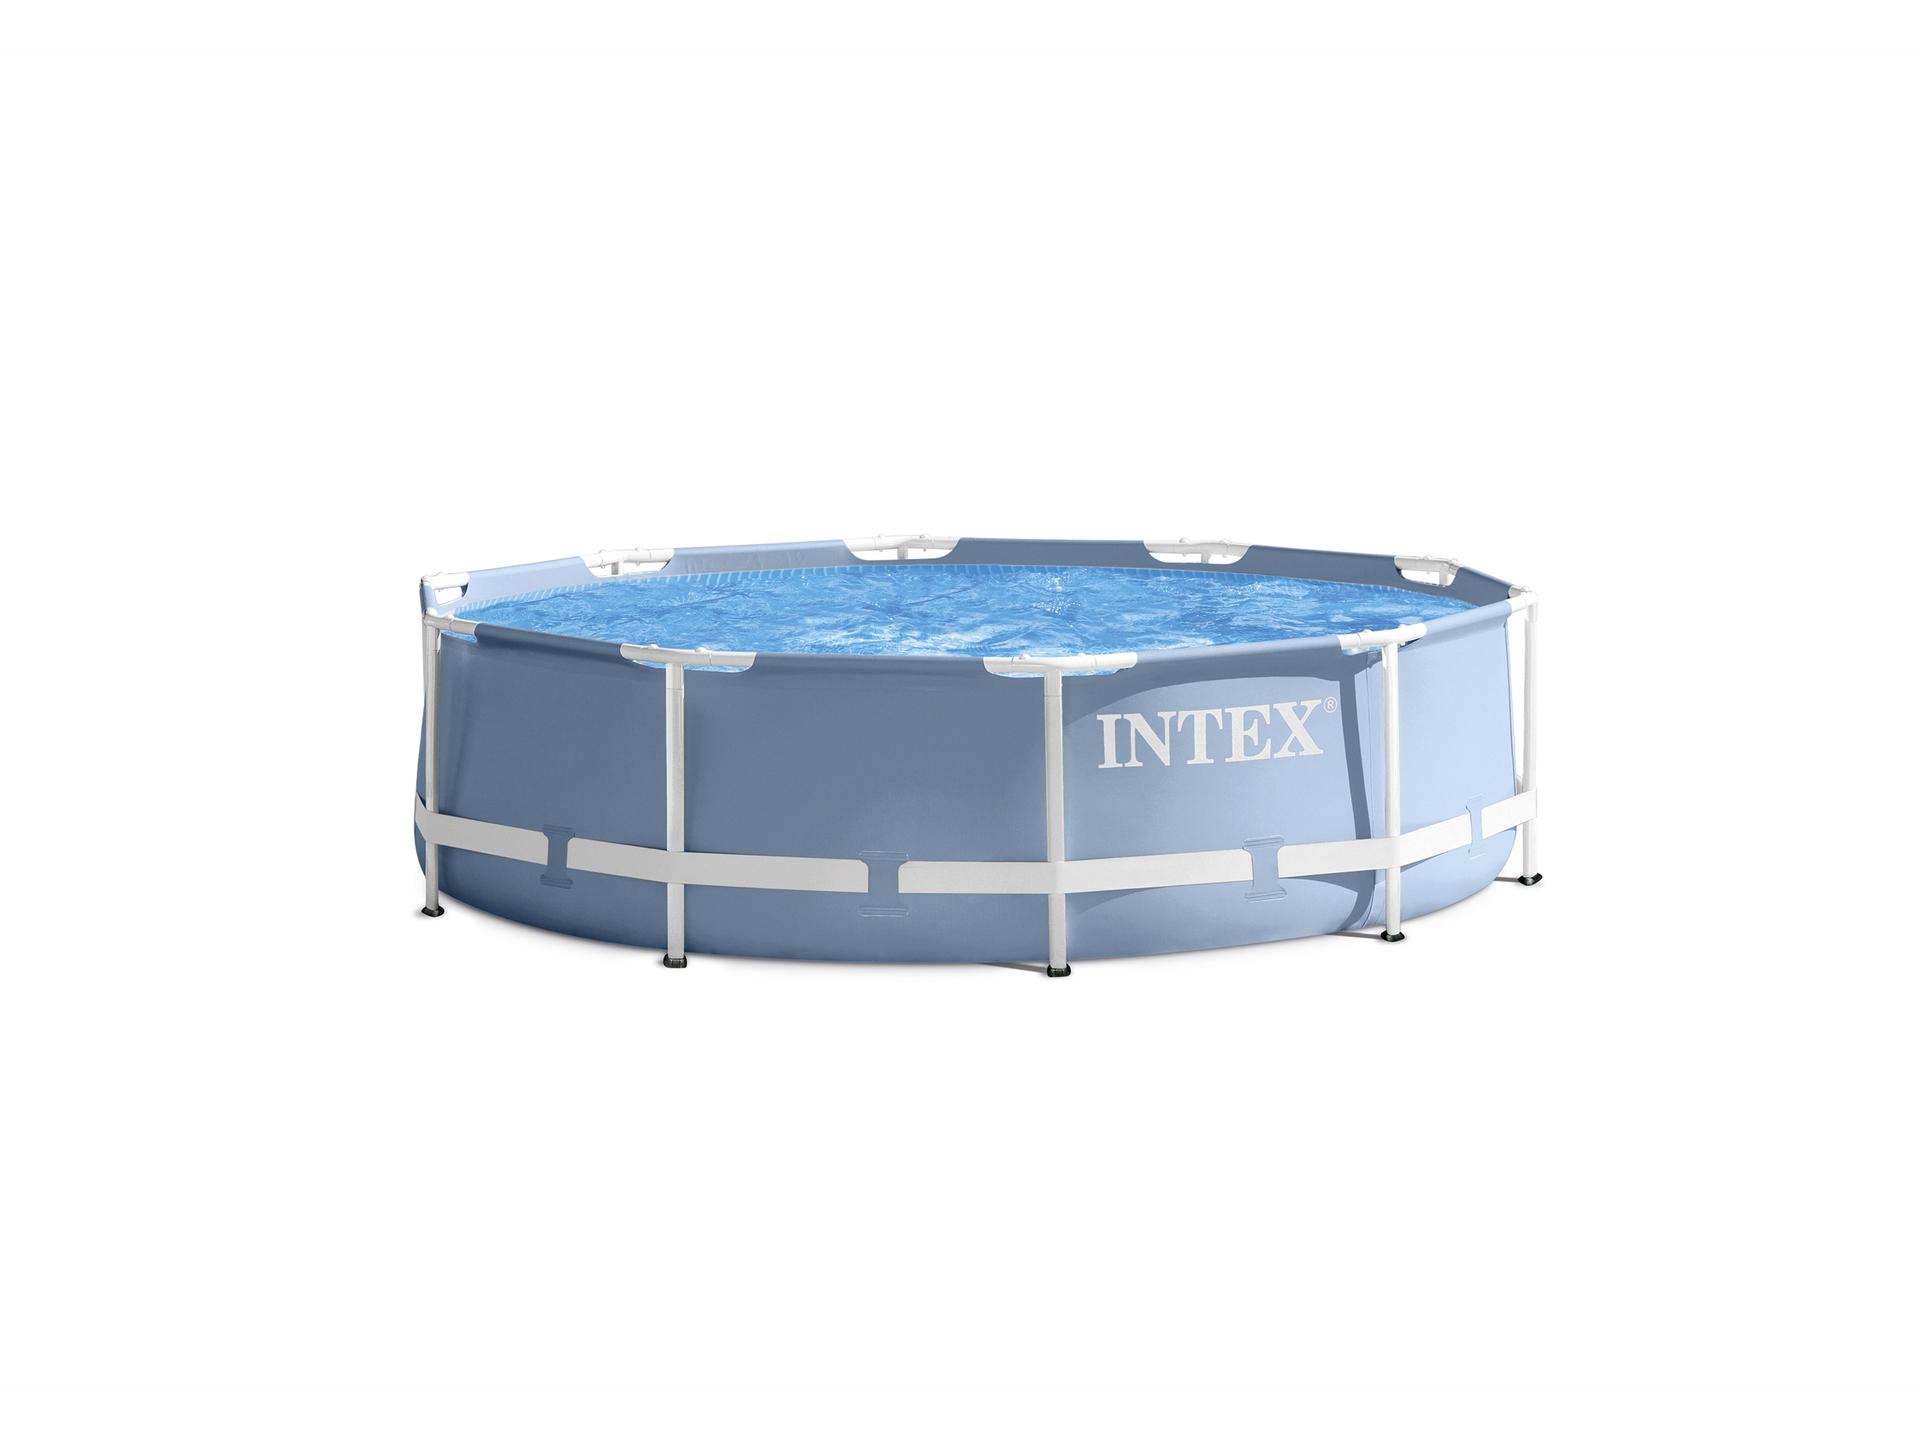 Intex familie zwembad Bad 305x76 inclusief Pomp